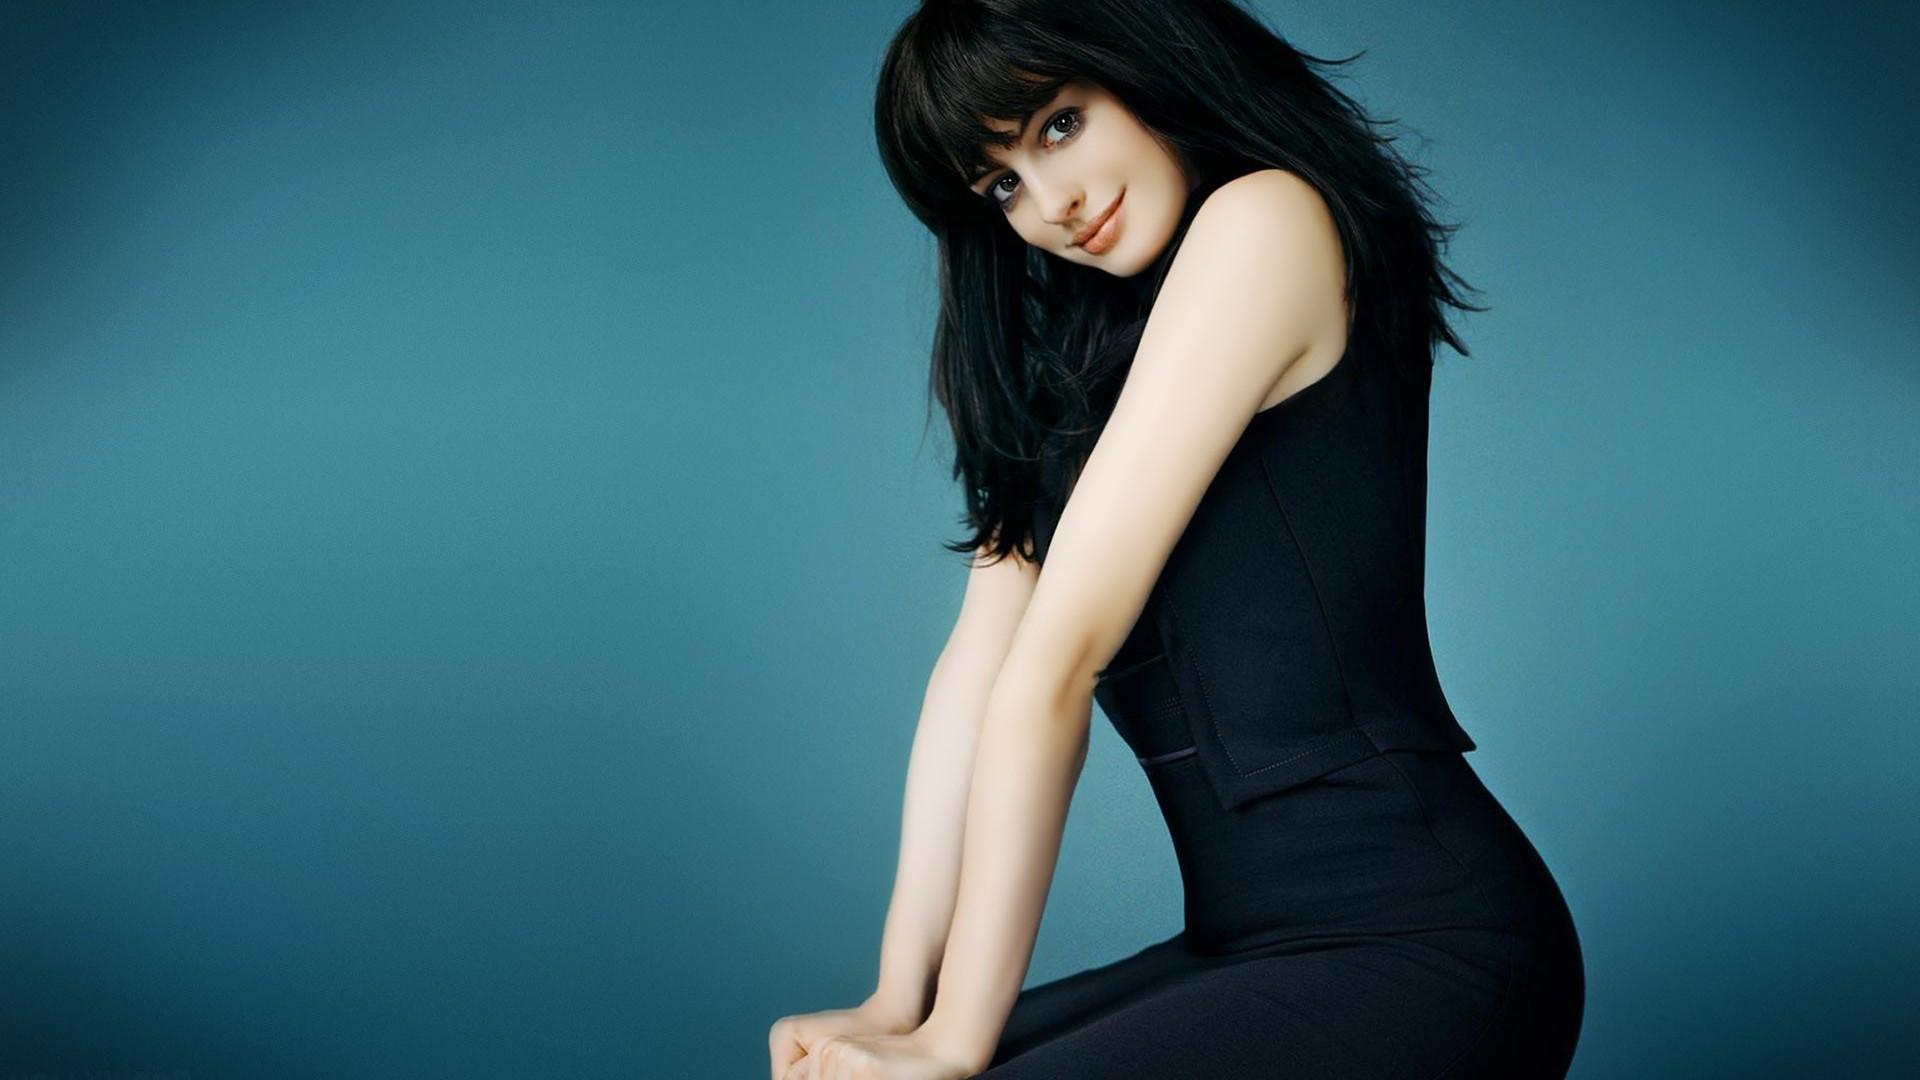 Full Hd Wallpapers Girls High Resolution Wallpaper - Anne Hathaway Long Black Hair , HD Wallpaper & Backgrounds